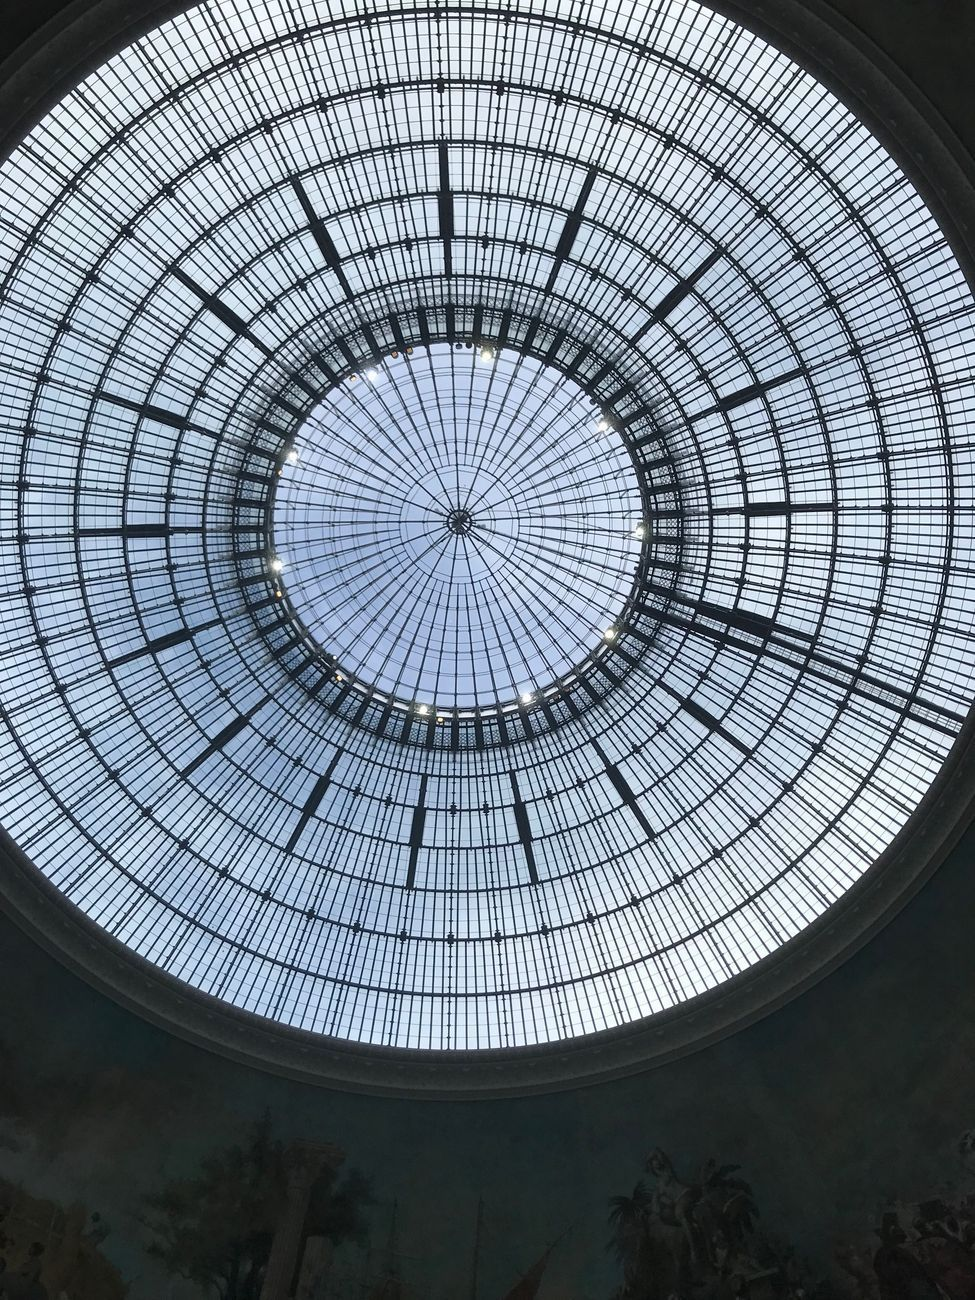 Bourse de Commerce — Pinault Collection, Parigi. Photo © Photo Dario Bragaglia